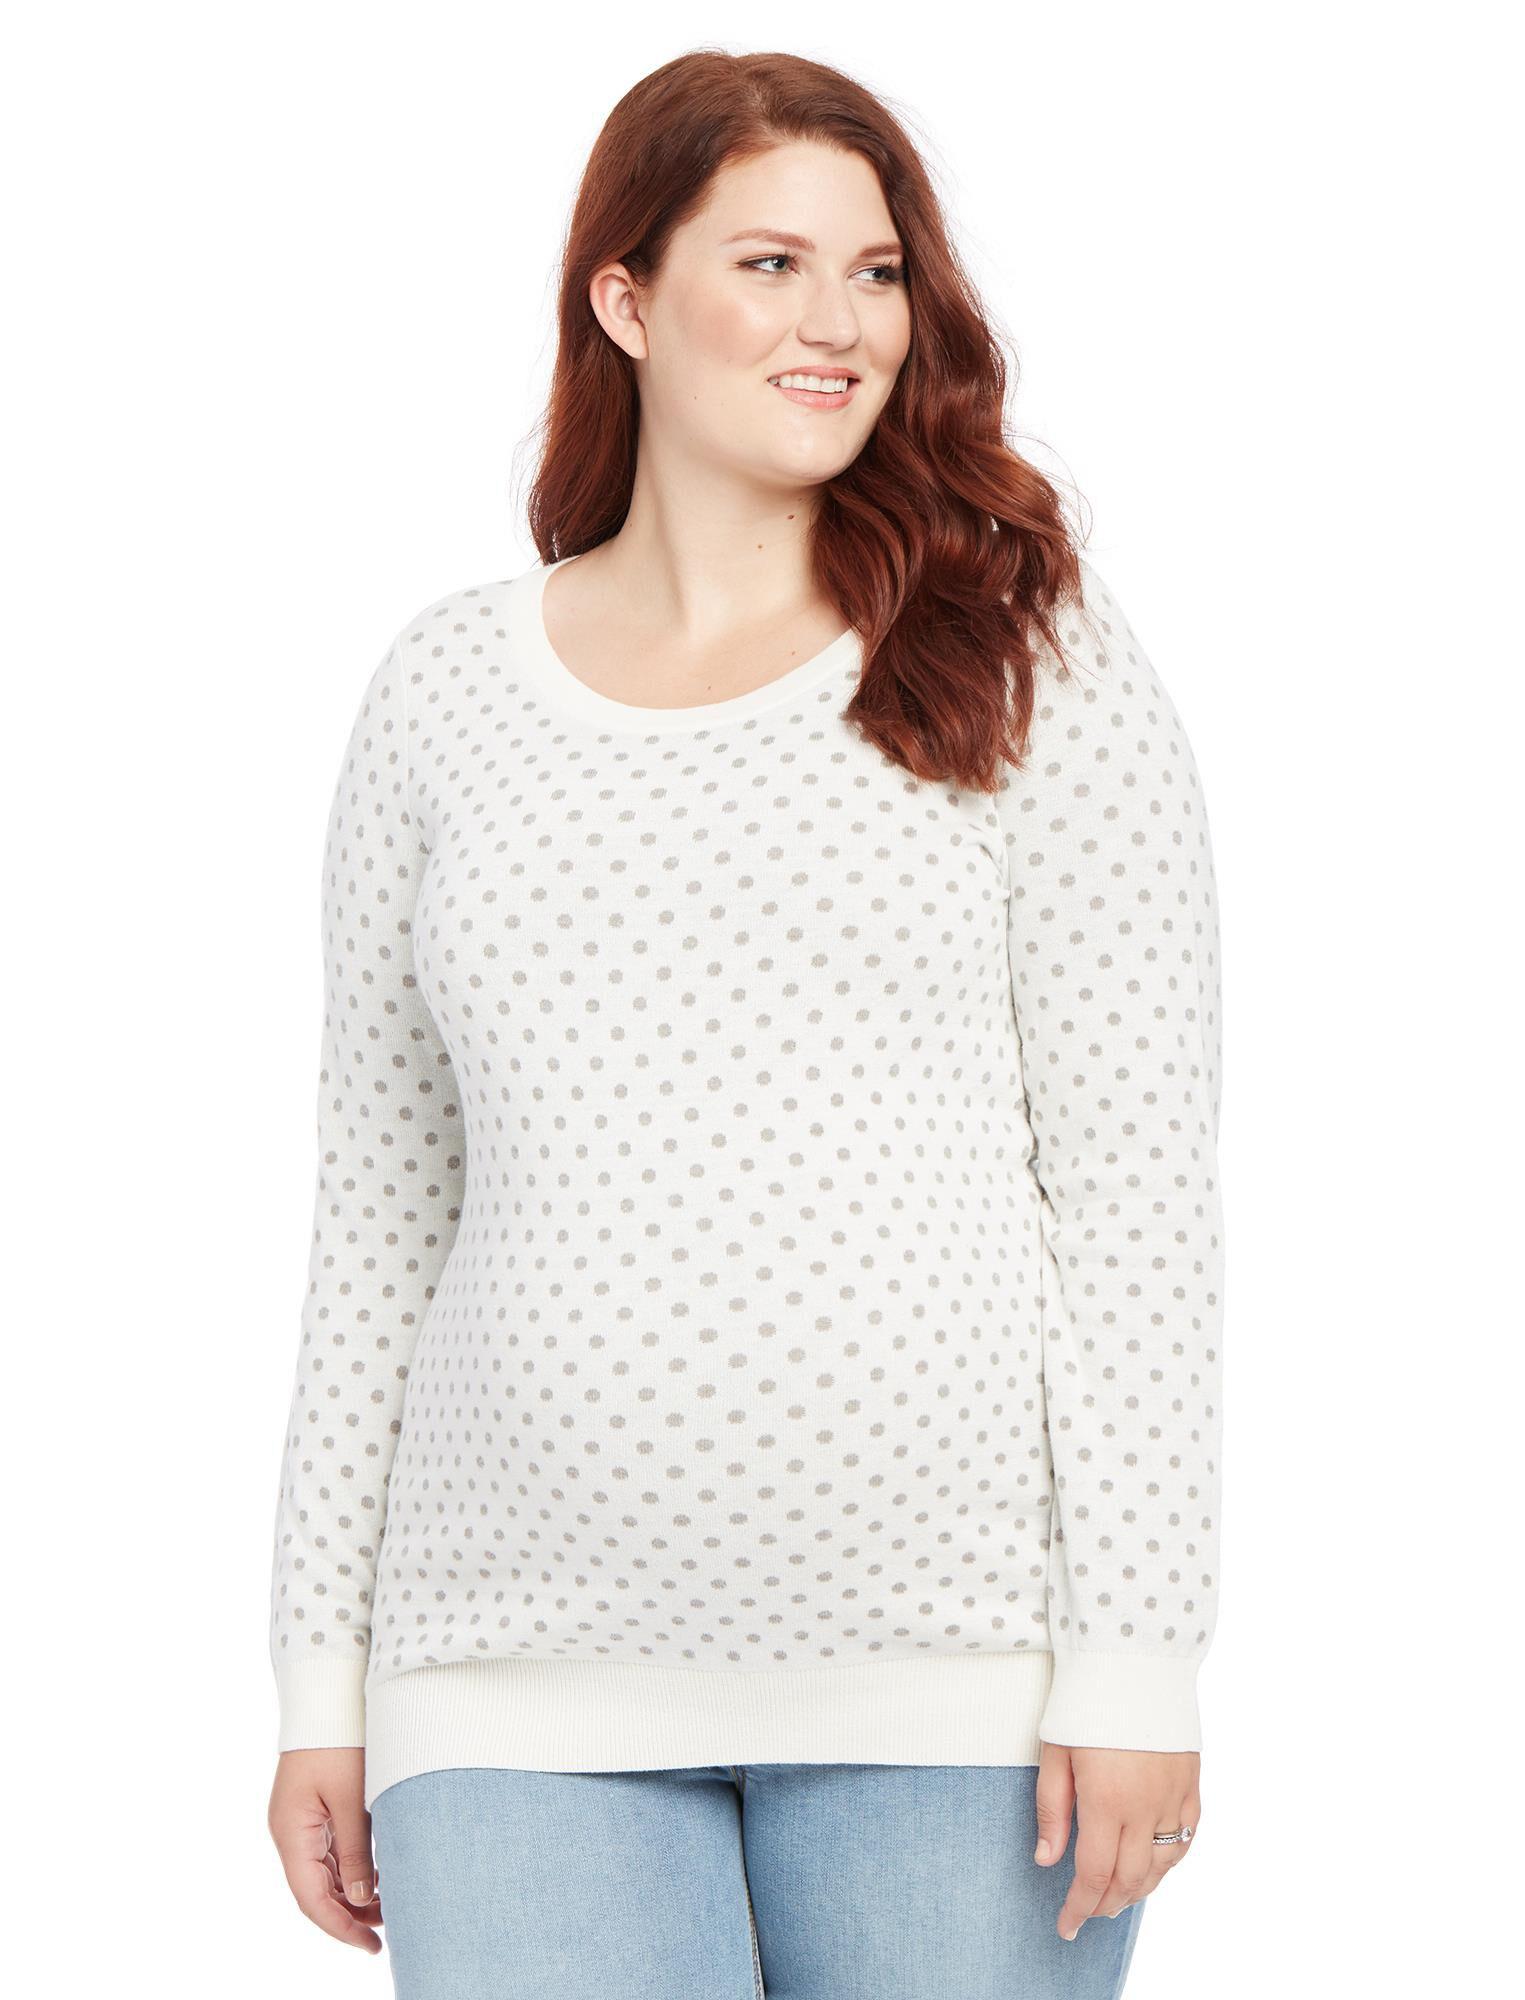 Plus Size Polka Dot Maternity Sweater